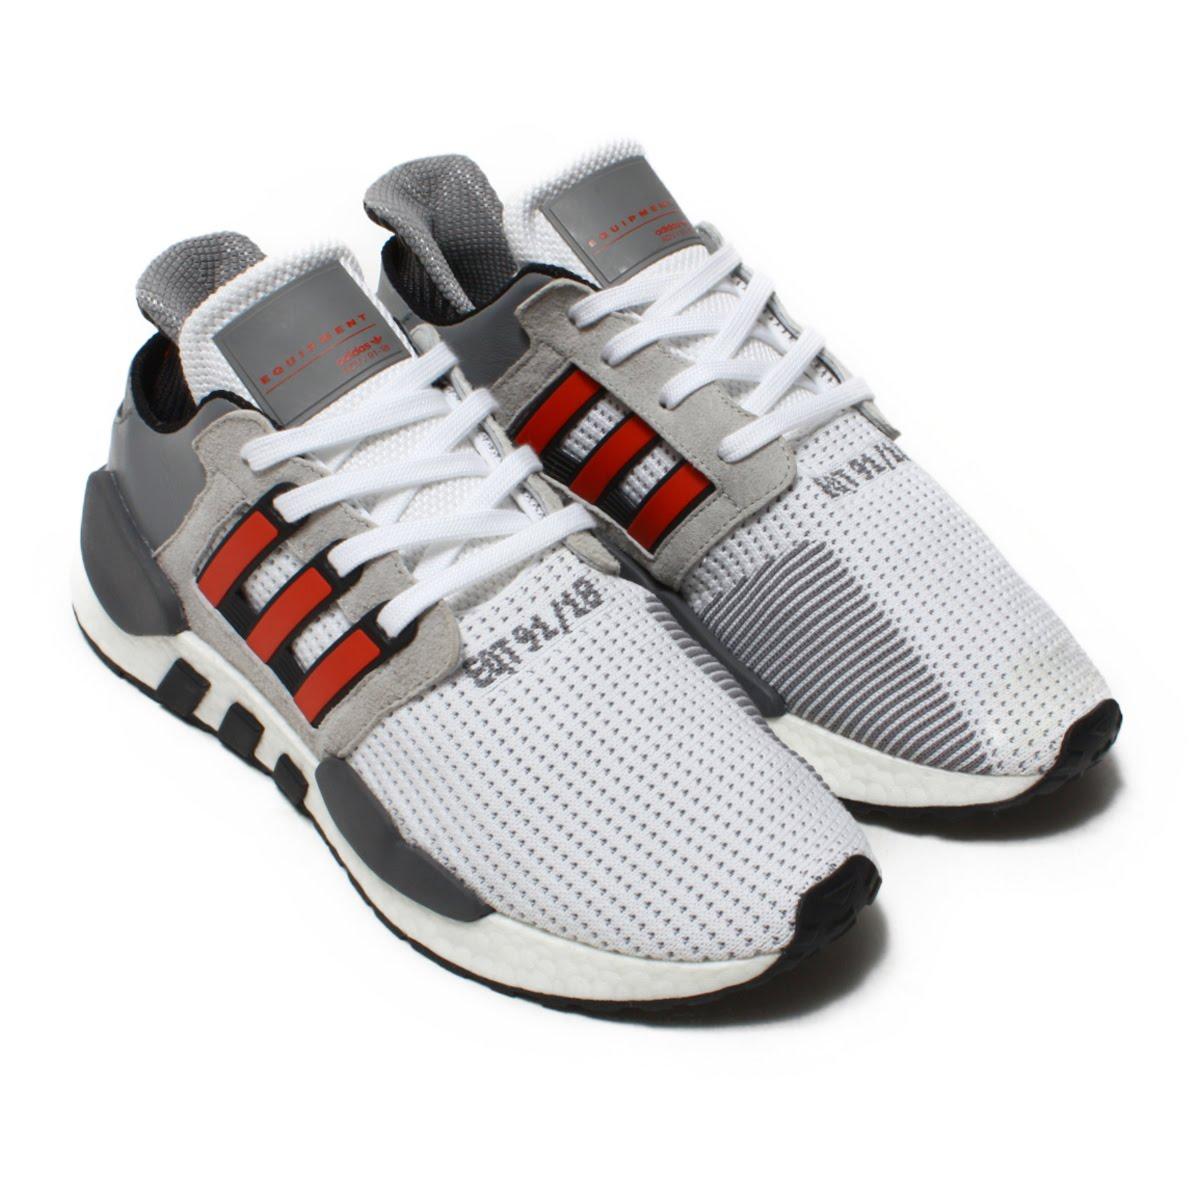 7a497e6af1709e adidas Originals EQT SUPPORT 91 18 (Adidas originals E cue tea support 91 18)  RUNNING WHITE HI-RES RED GREY 18FW-I